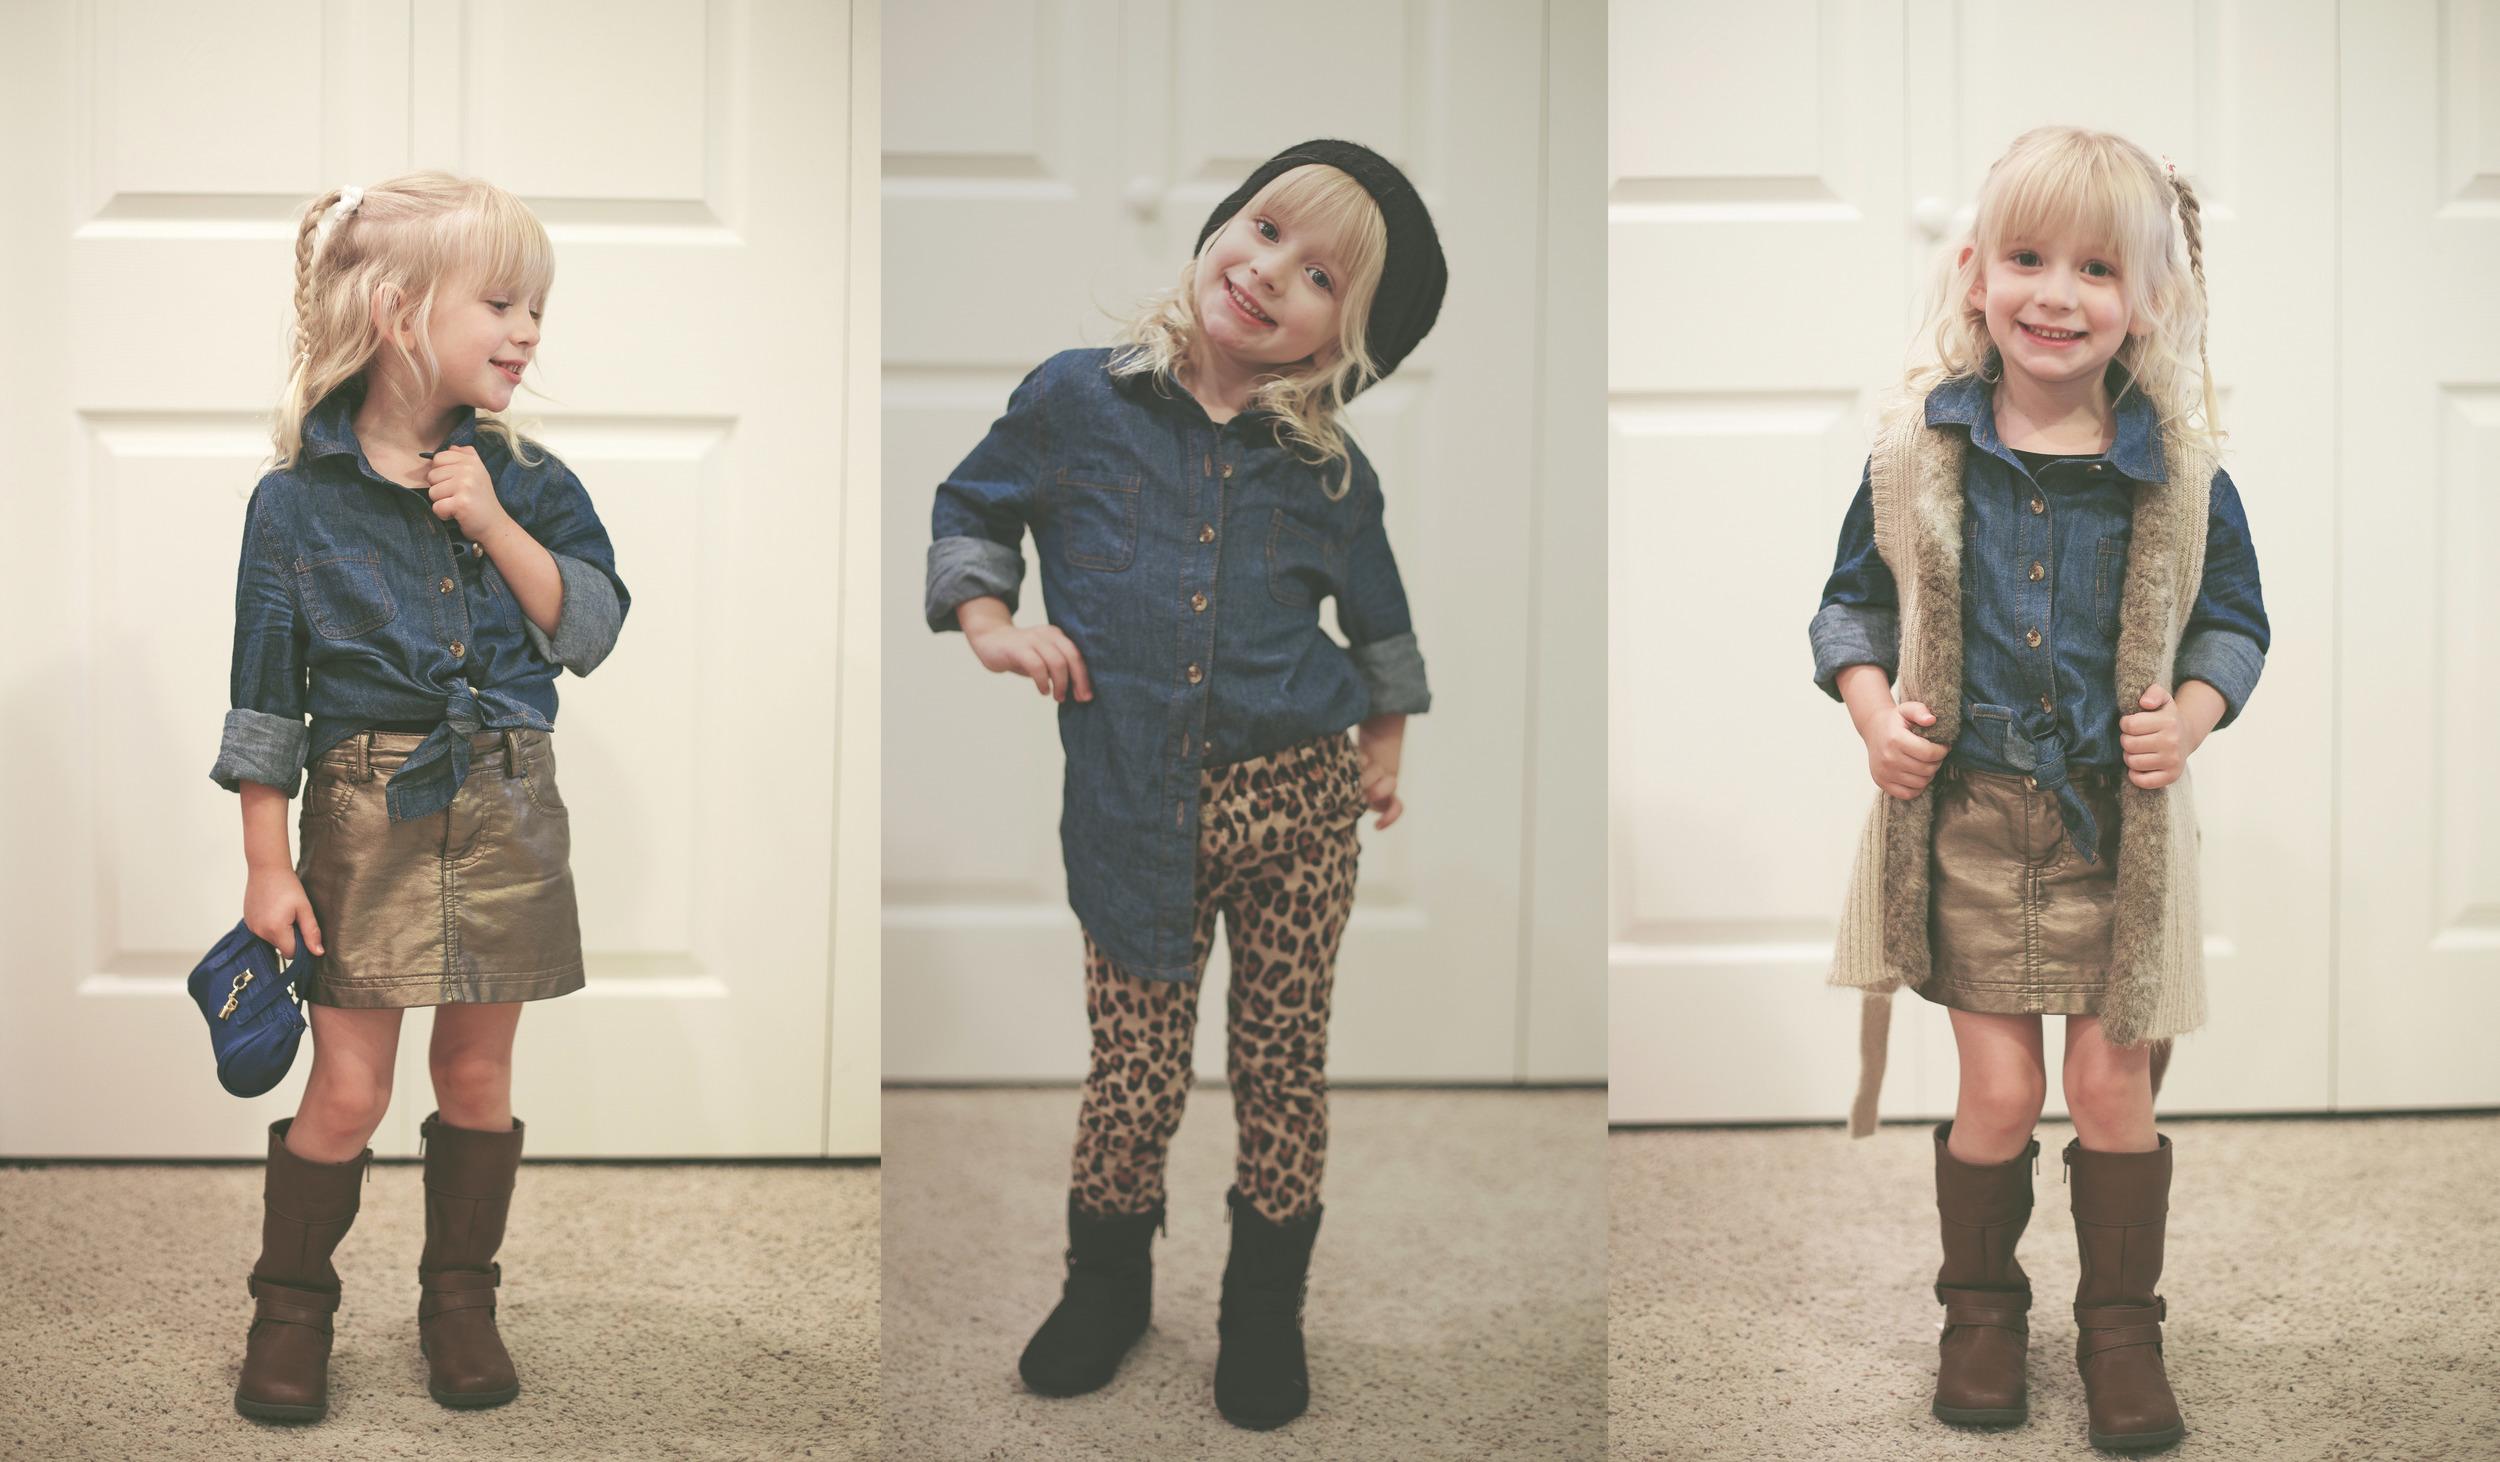 Gold Pleather Skirt & Boots - Joe Fresh    //    Cheetah Pants - Baby Gap     //     Sweater Vest - H&M